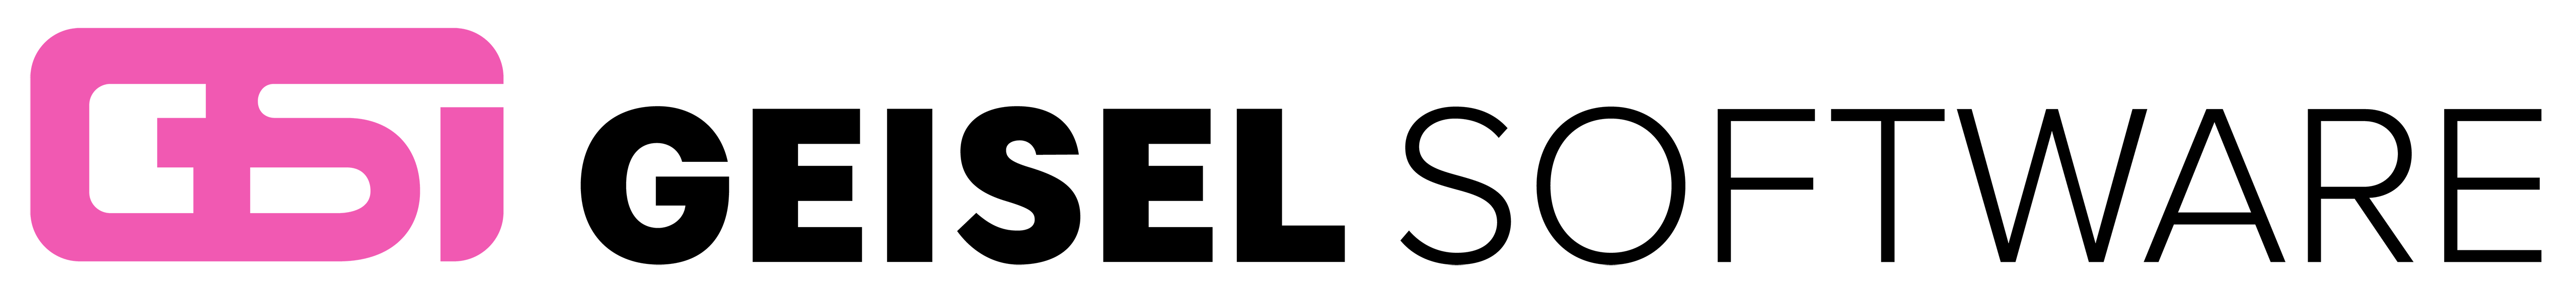 Geisel Software Logo